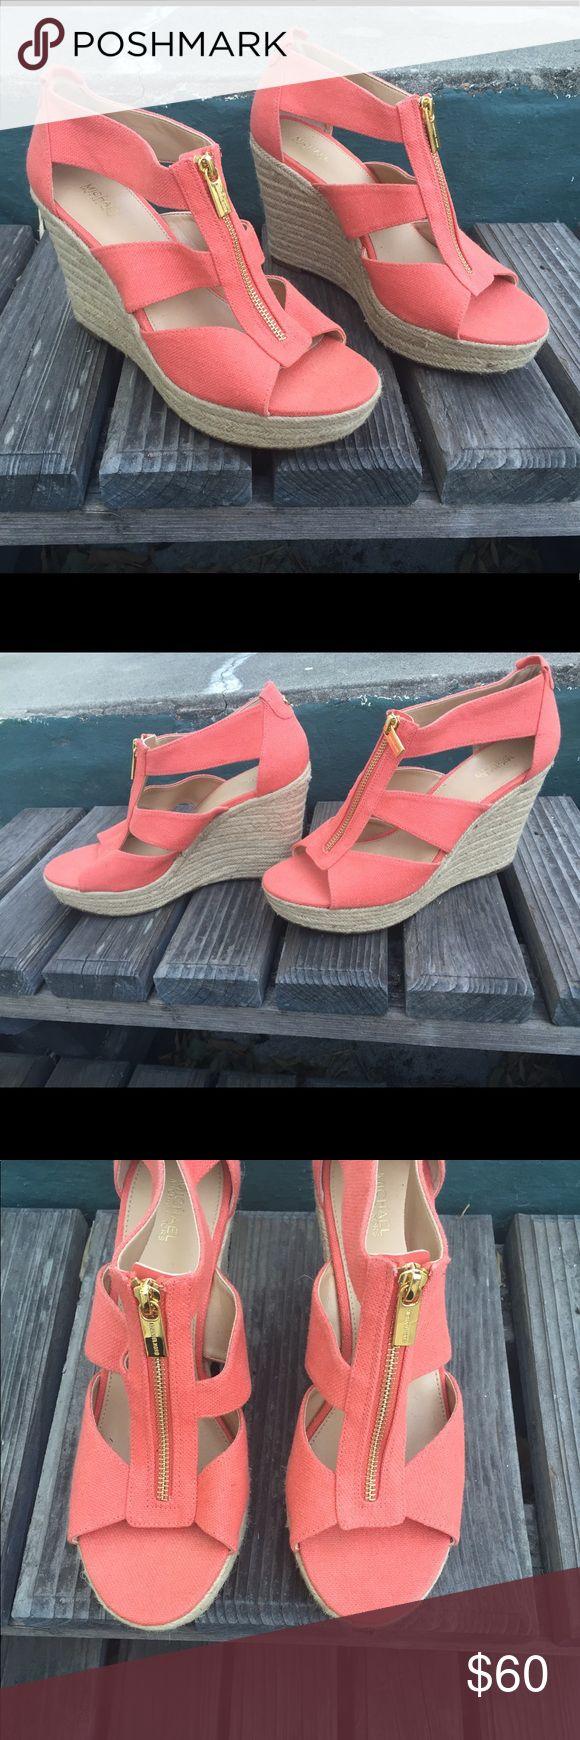 Michael Kors  orange wedge sandal w/zipper,  9 .5 Cute orange wedge sandals by Michael Kors. Size 9.5.  Great fall color . Super cute! NWT Michael Kors Shoes Wedges